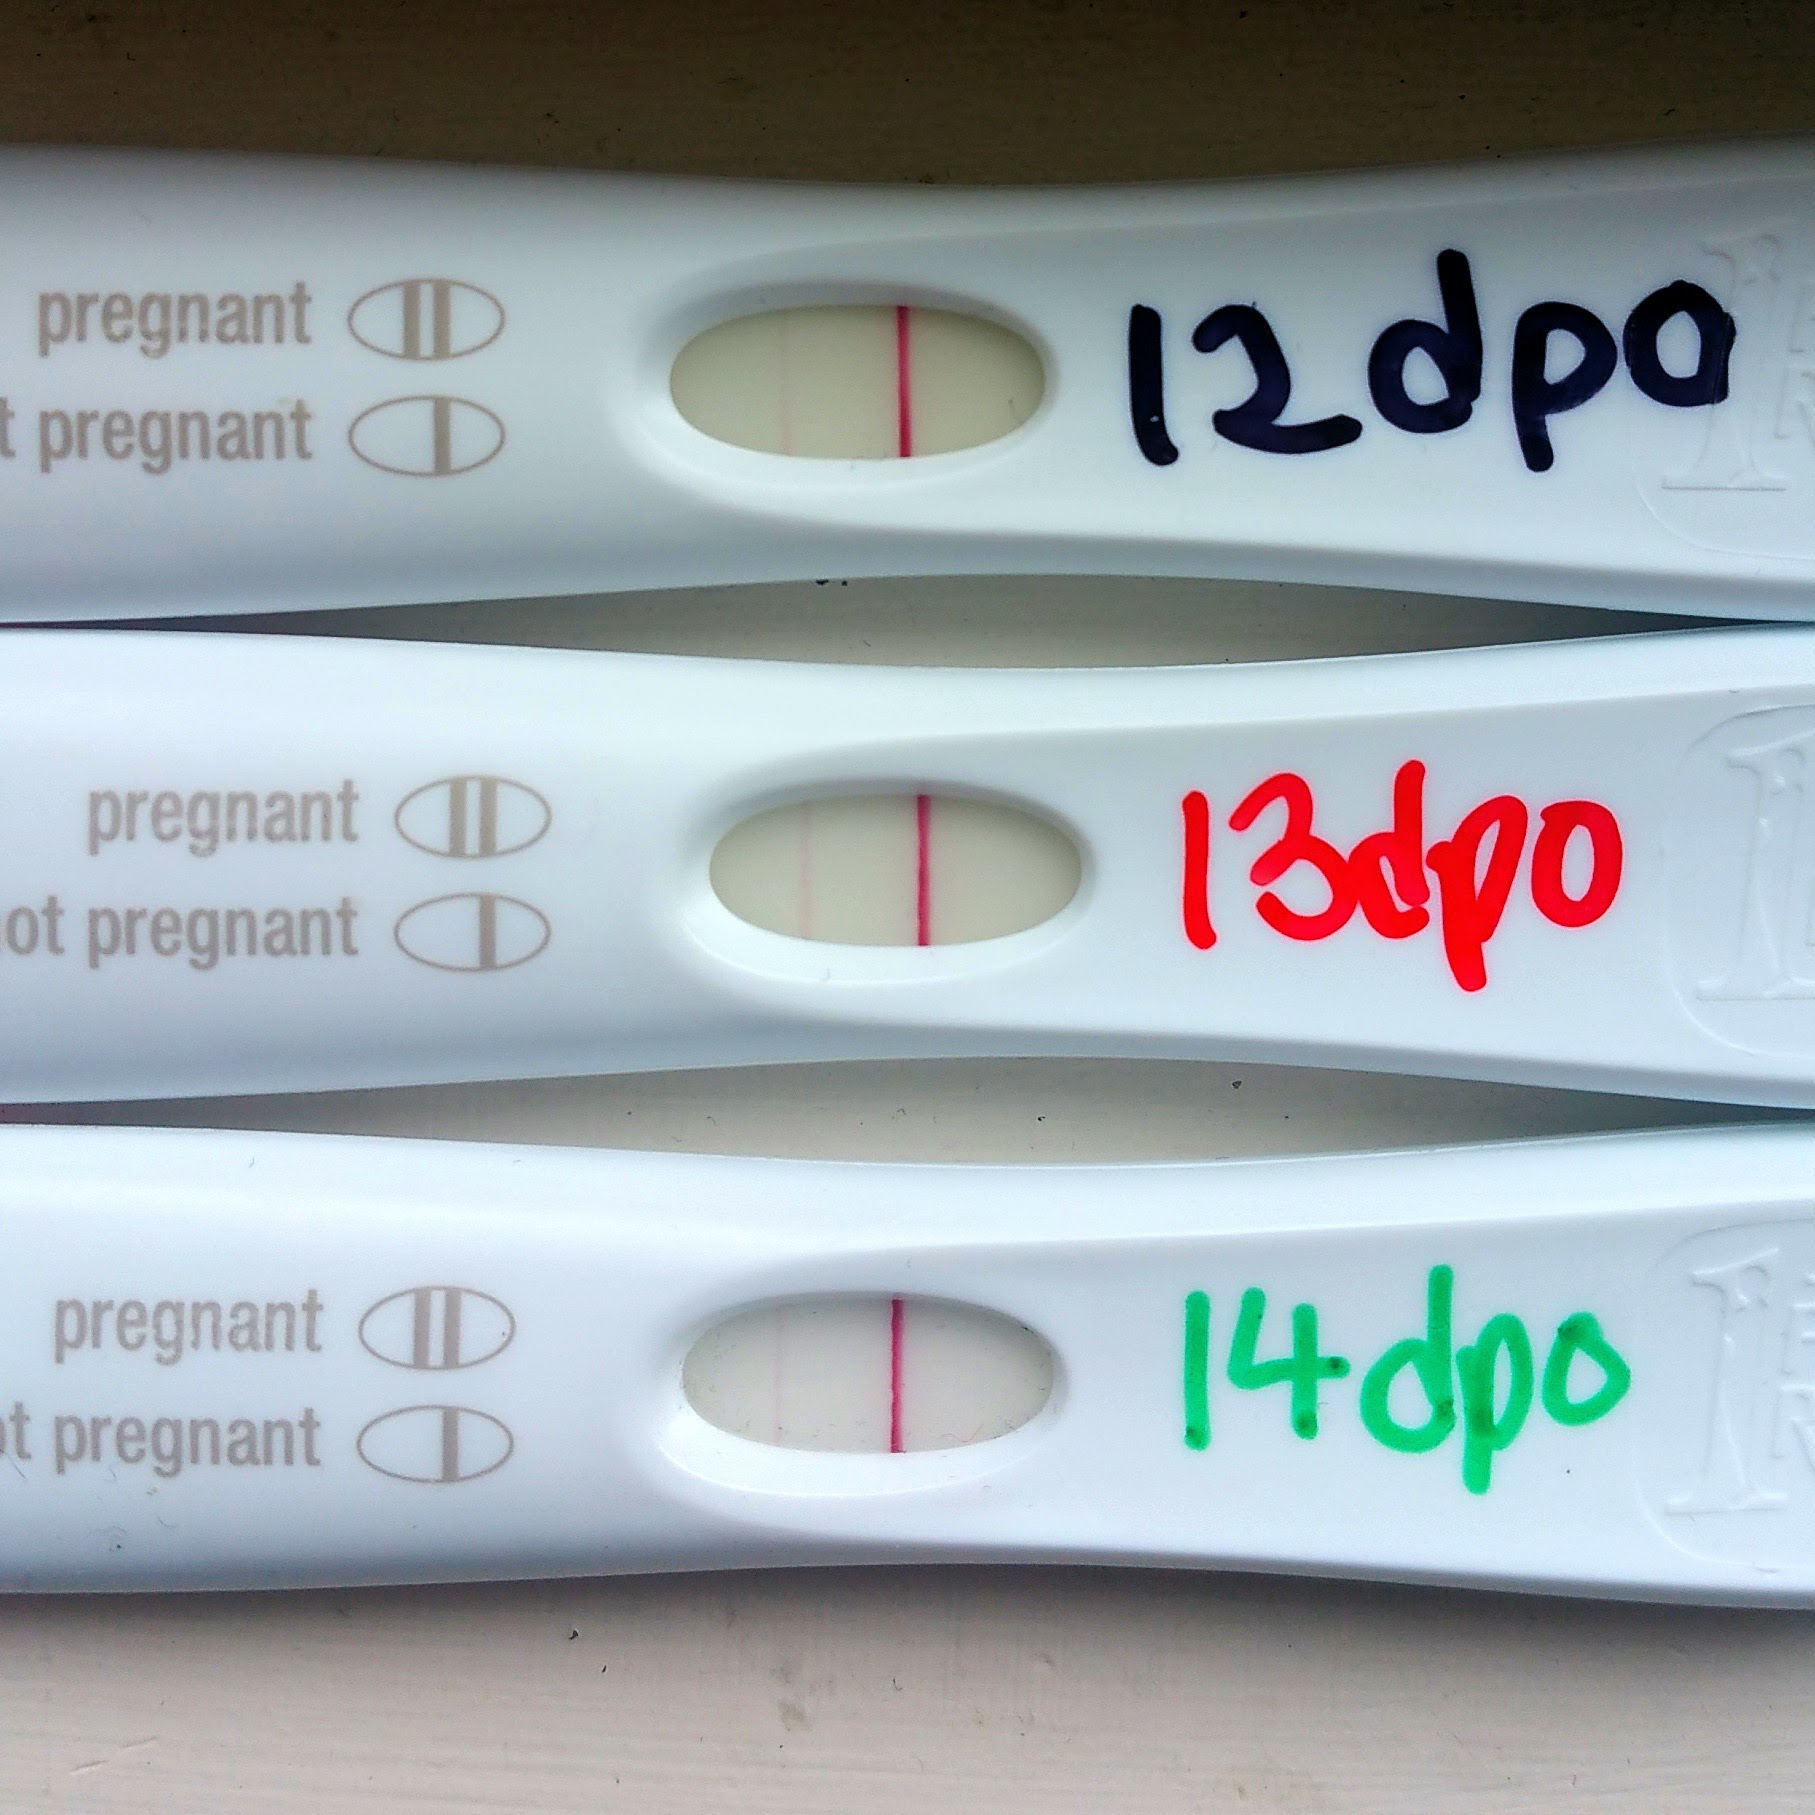 11 Dpo Negative Pregnancy Test Could I Still Be Pregnant ...